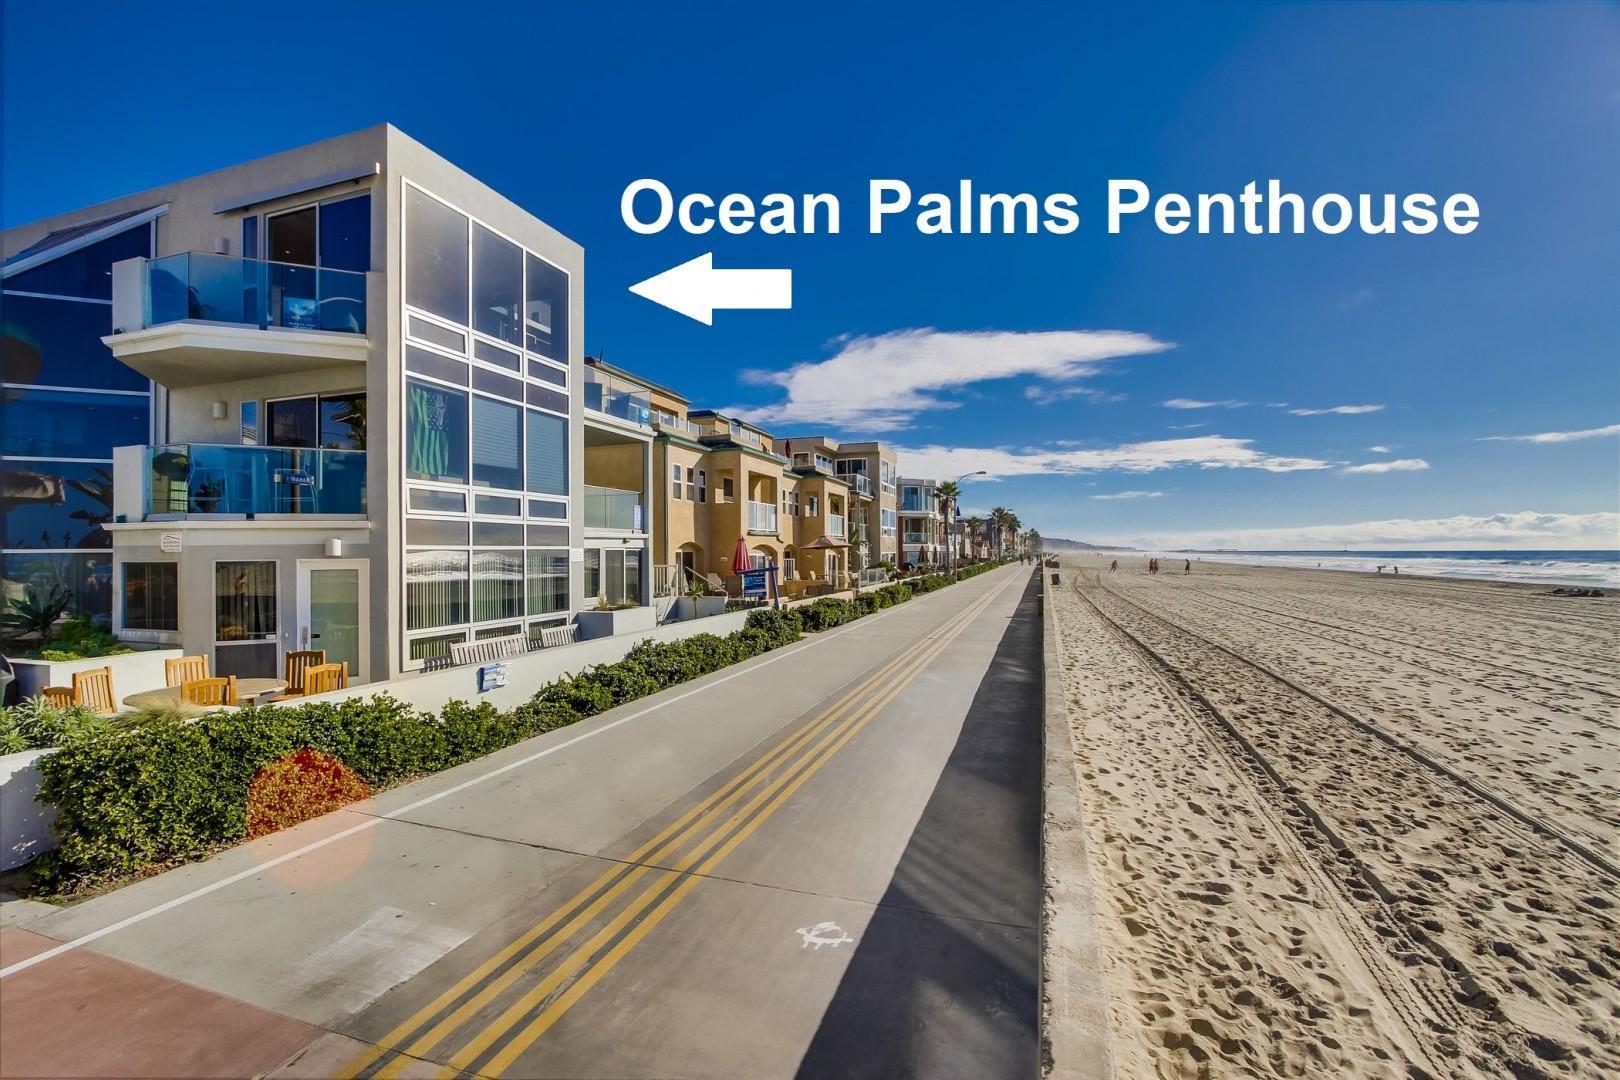 B5188 Ocean Palms Penthouse